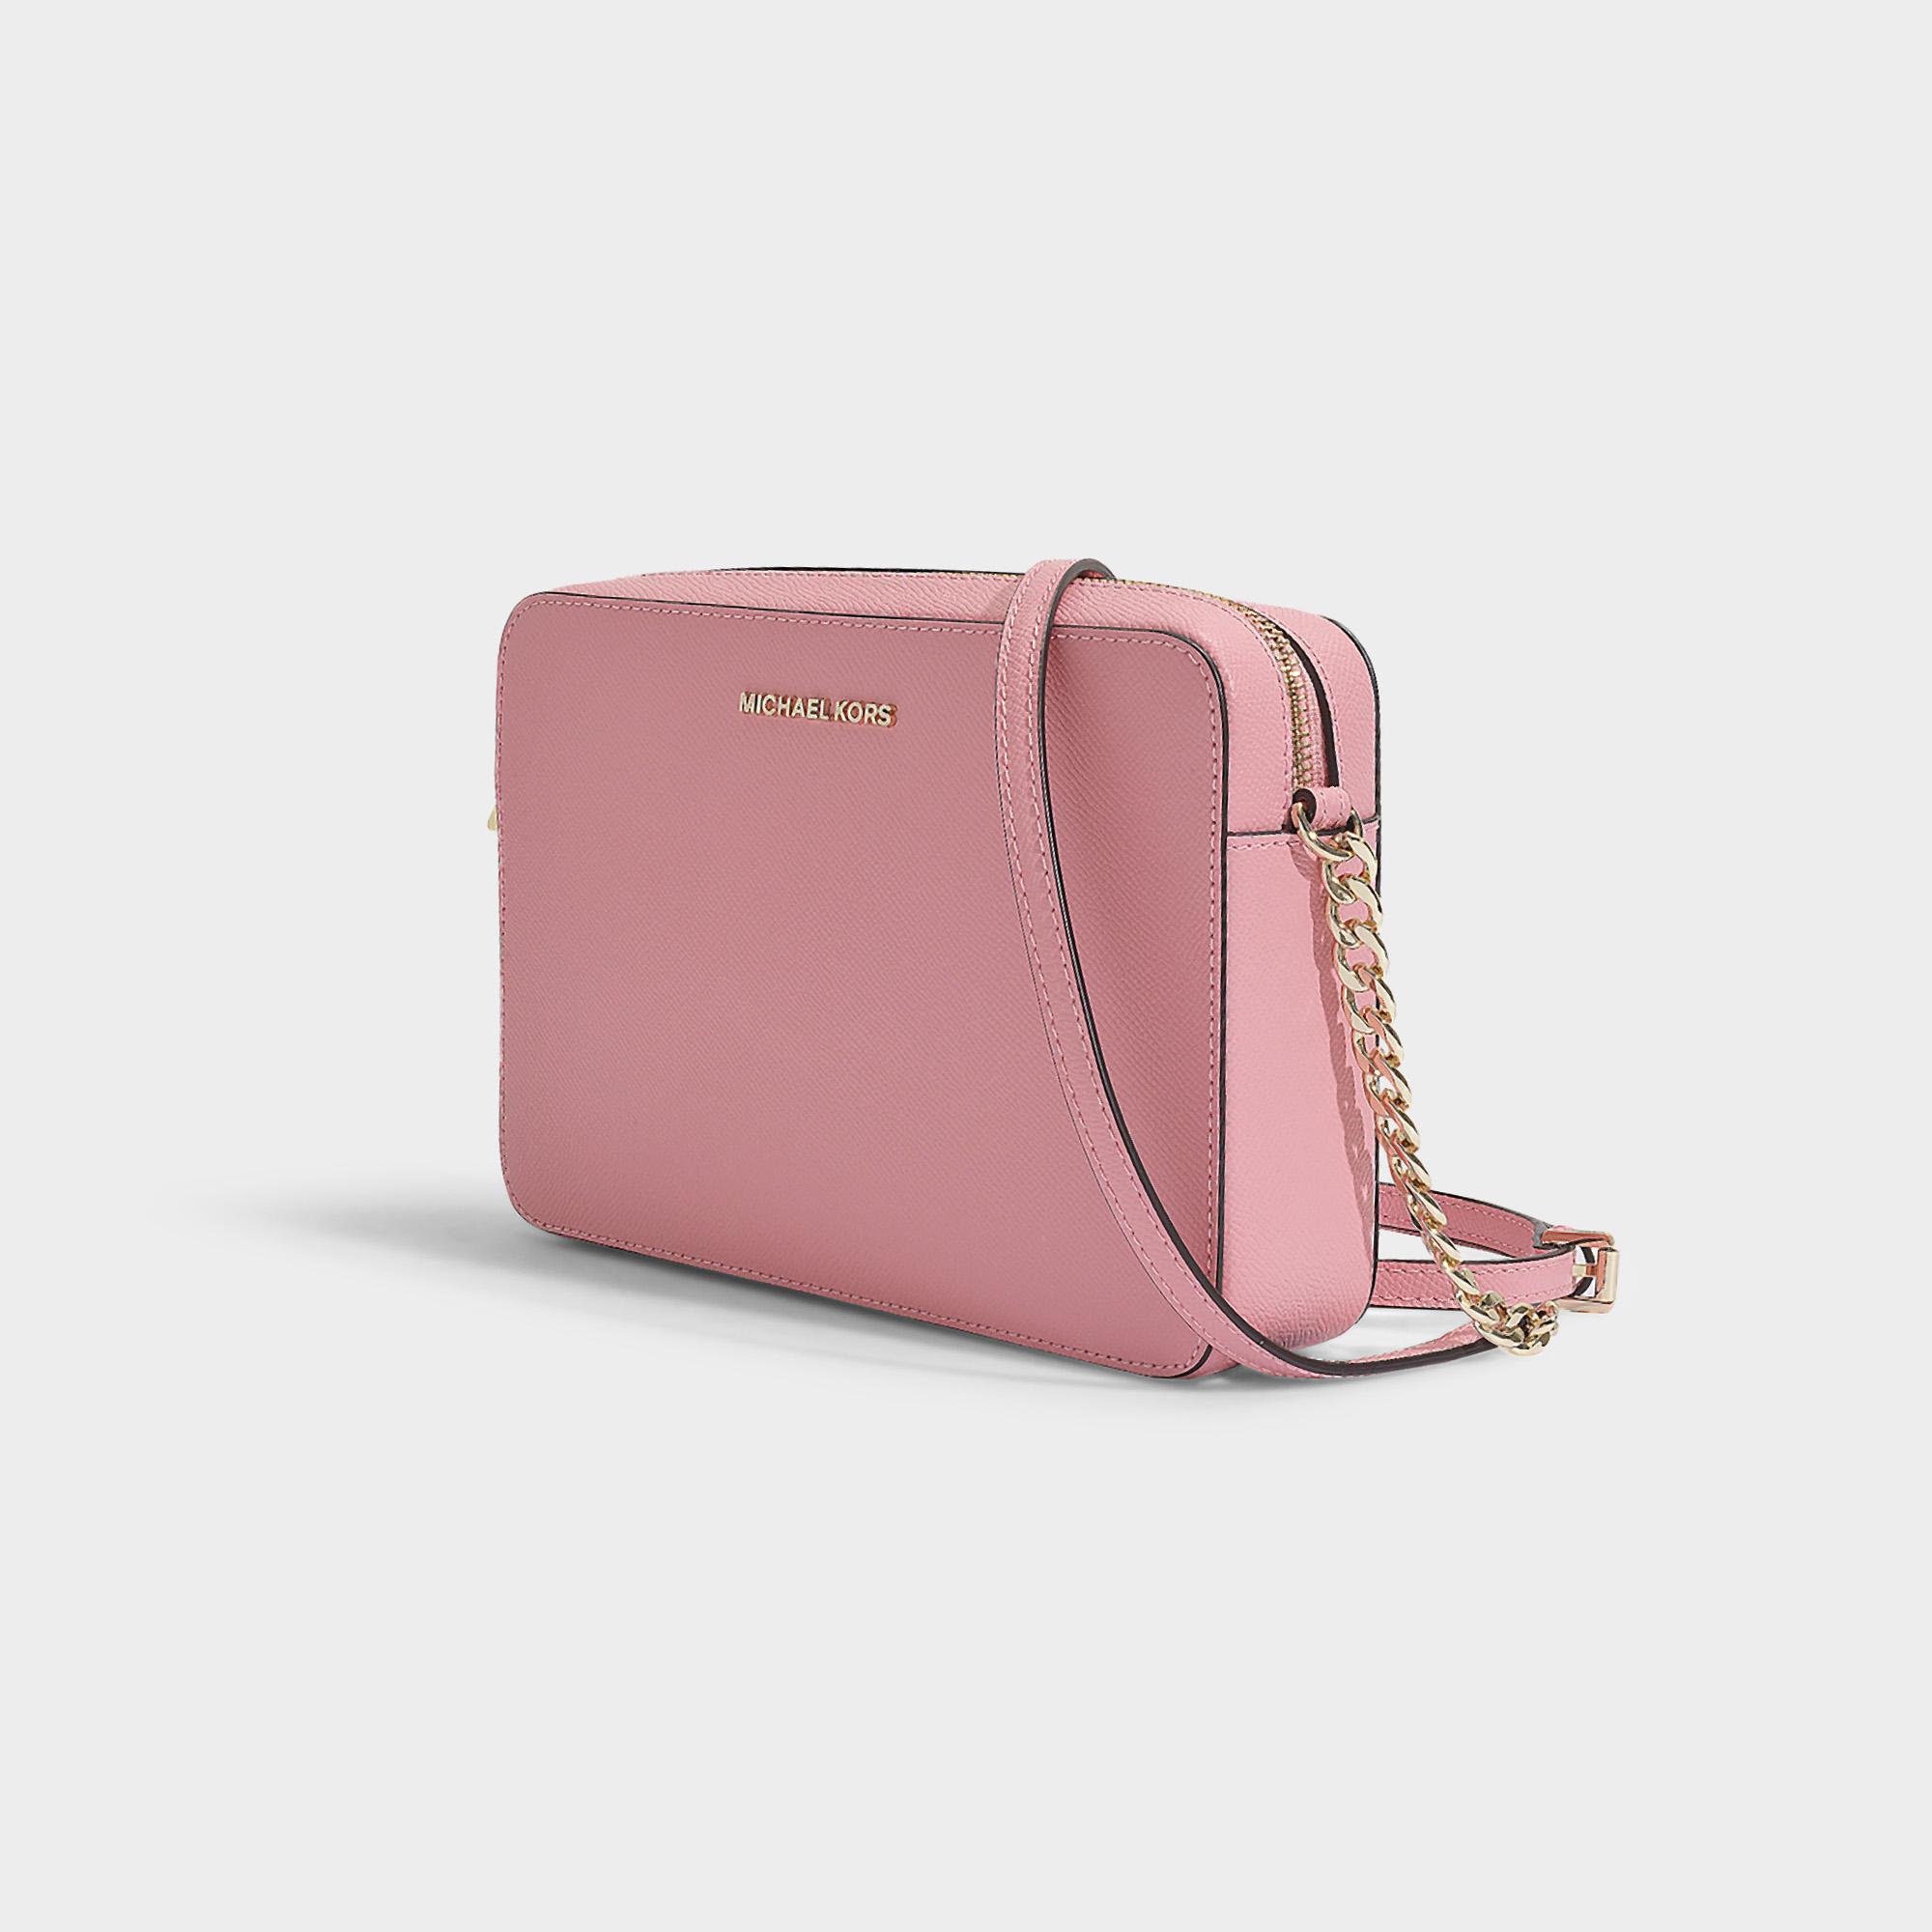 43f7d4a2c395dd MICHAEL Michael Kors - Pink Large East West Crossbody Bag In Carnation  Crossgrain Leather - Lyst. View fullscreen